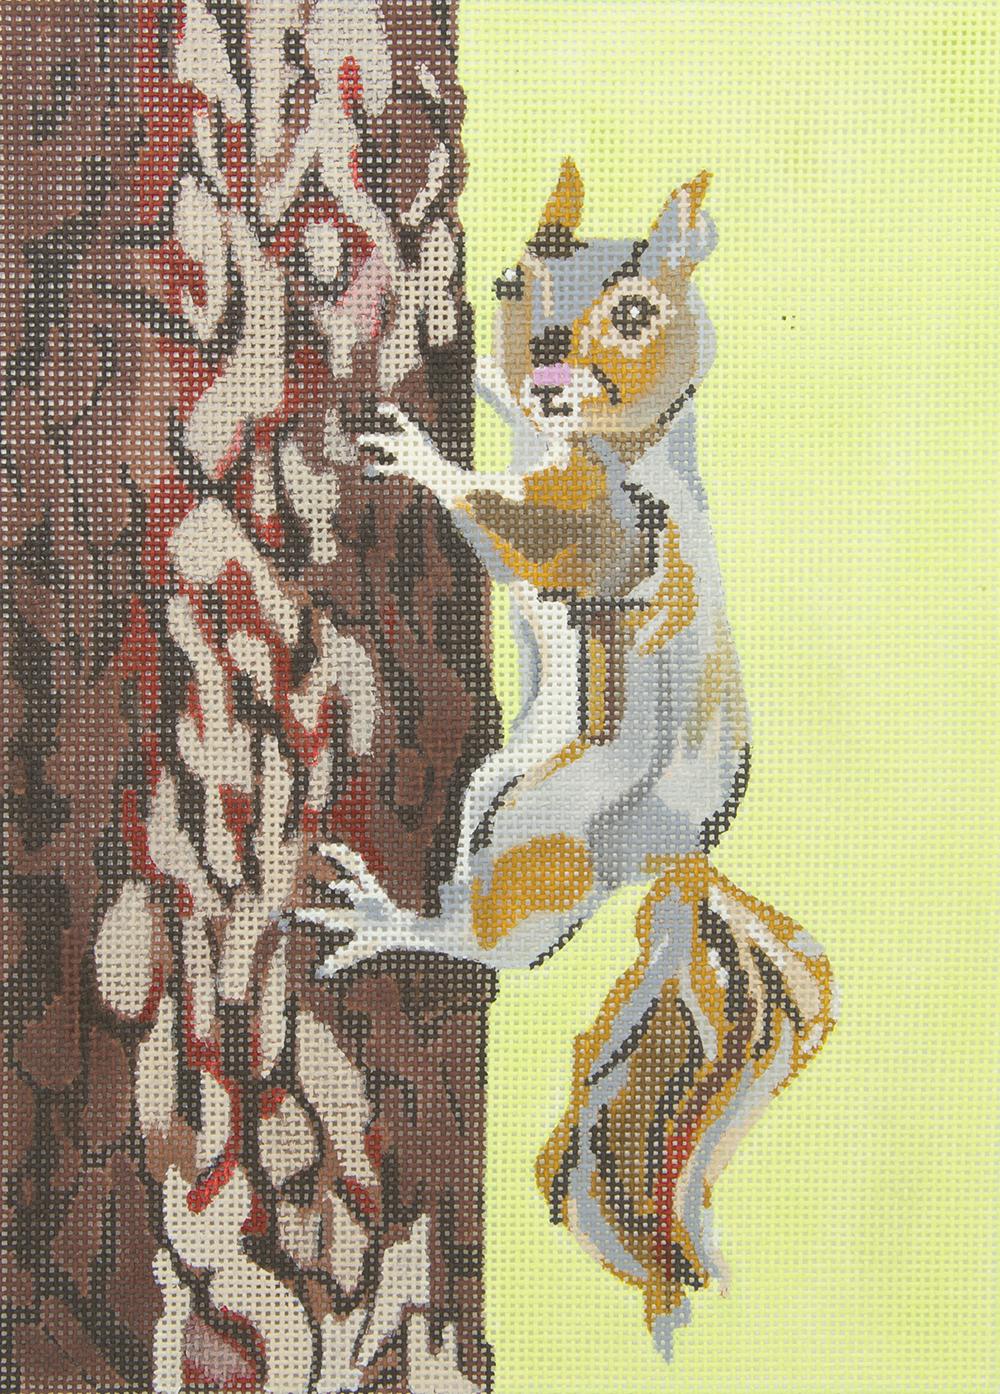 JKNA065 Squirrel on Trunk Judy Keenan